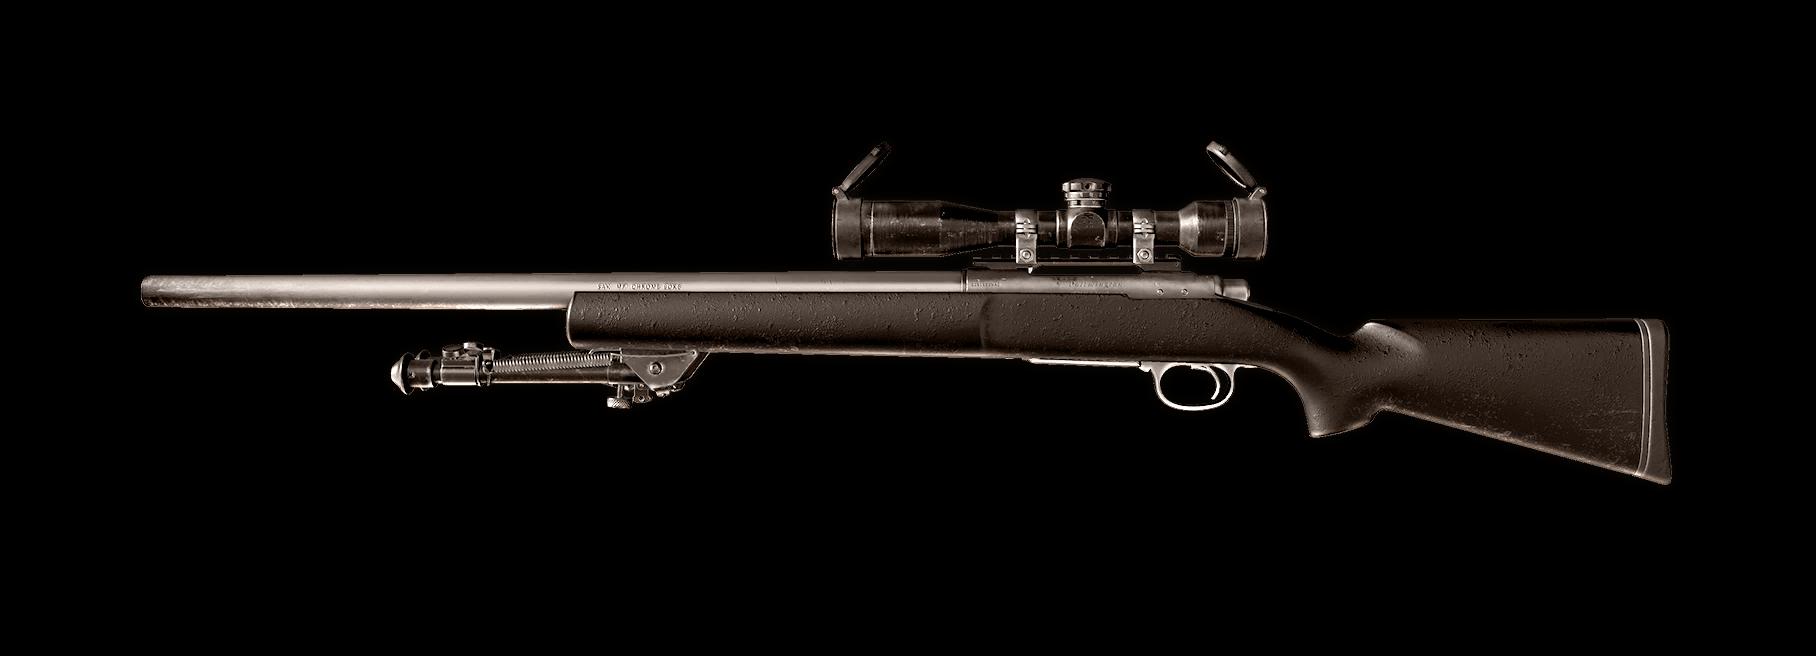 Image of Pelington 703